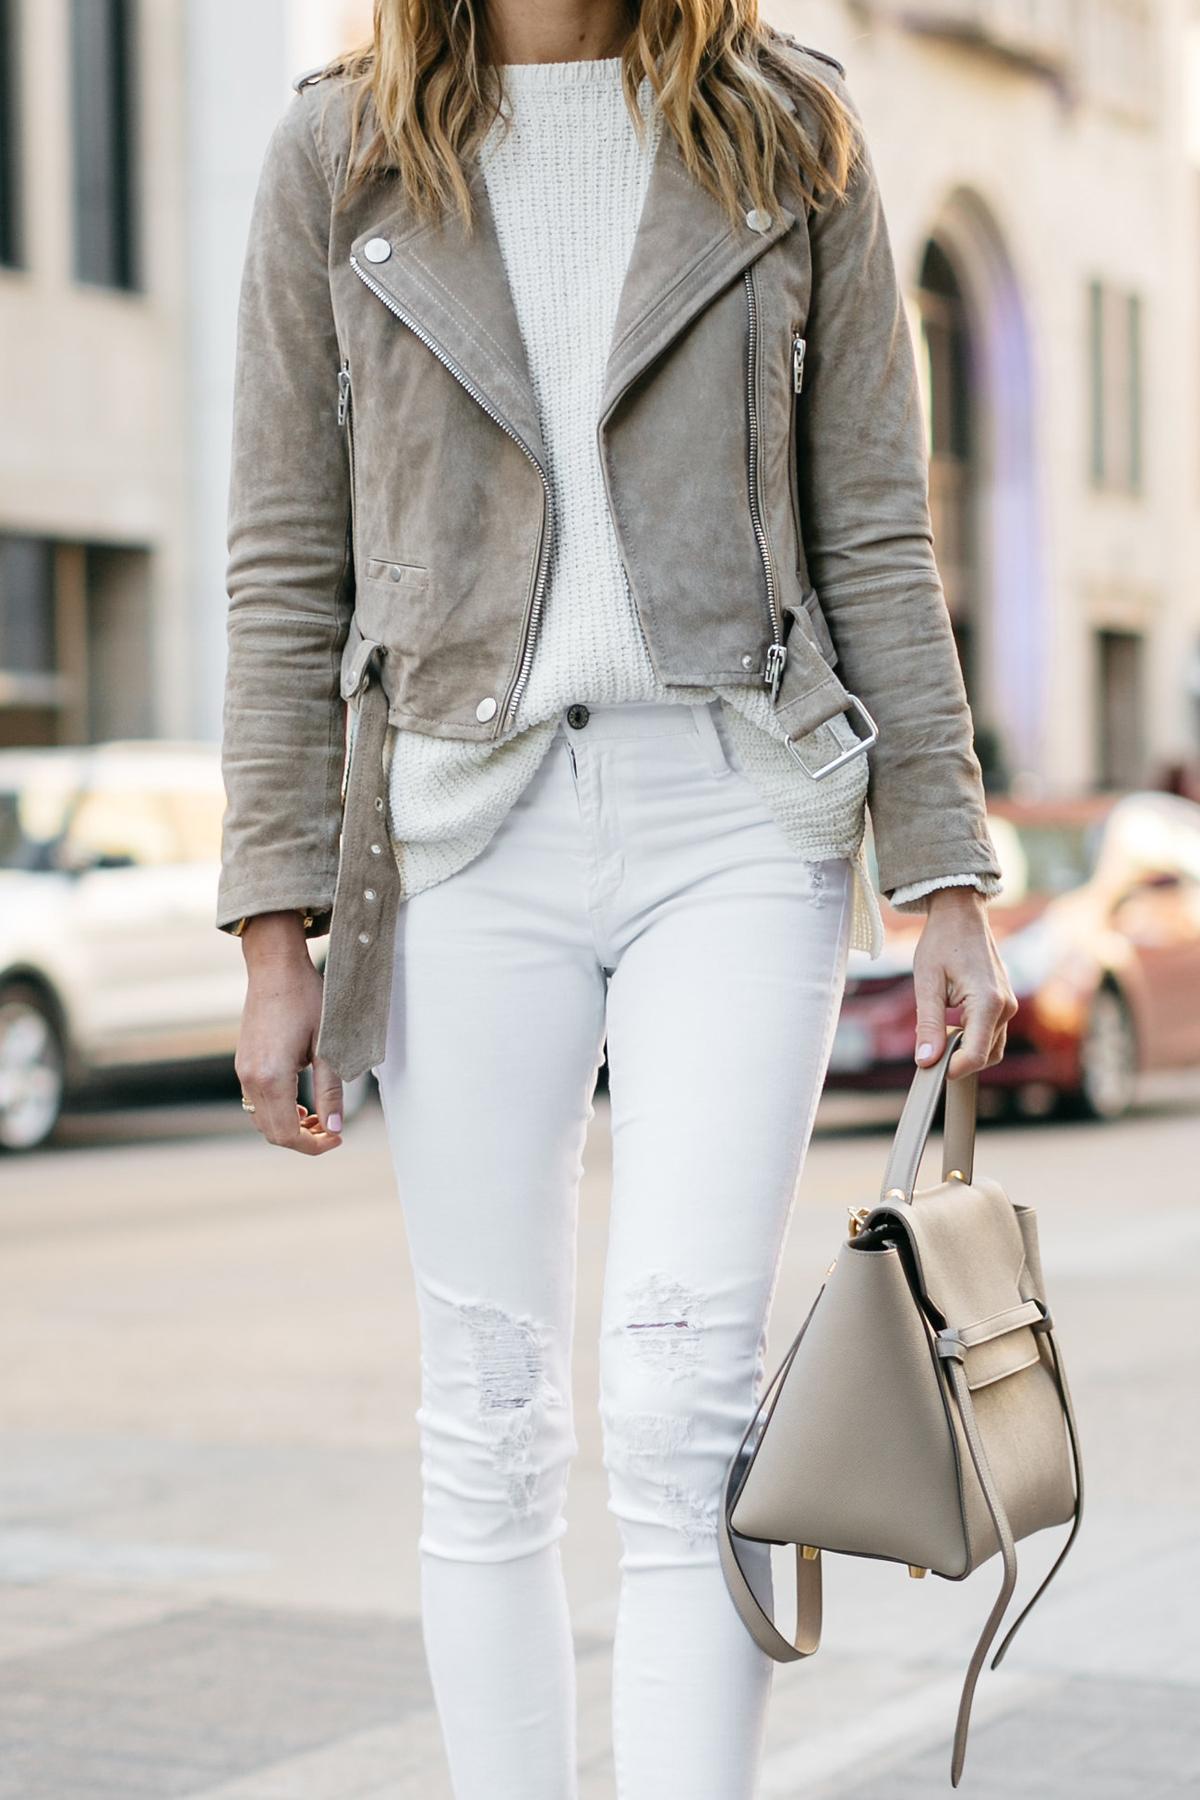 Street Style, Tan Suede Moto Jacket, James Jeans White Skinny Jeans, White Sweater, Celine Belt Bag, Nude Pumps